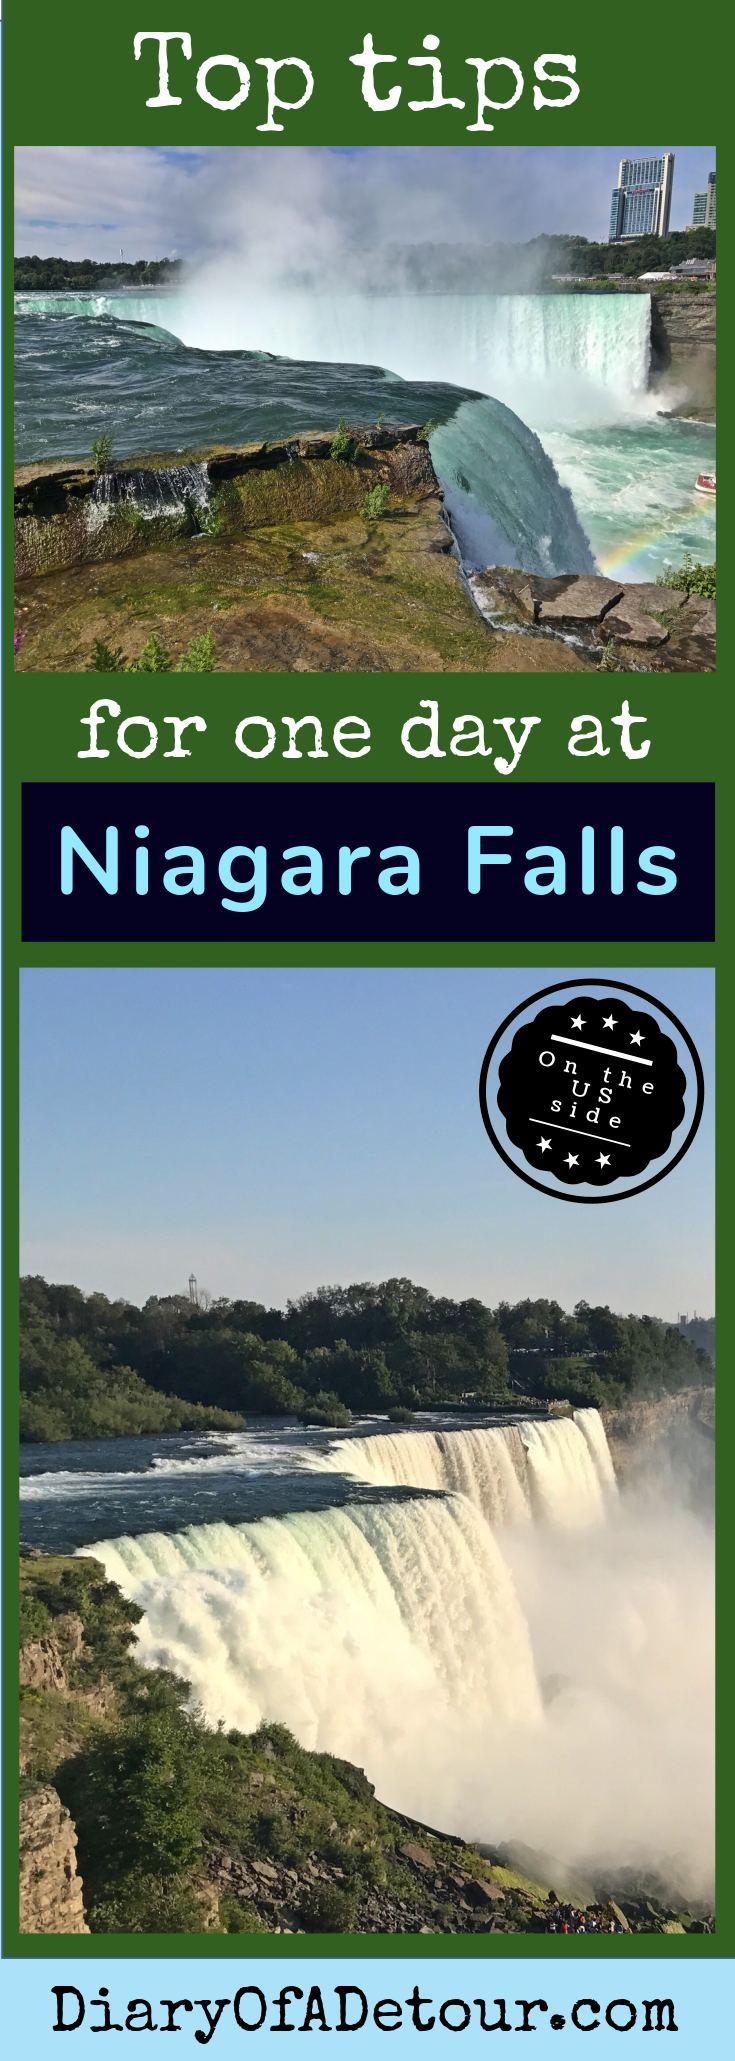 top-tips-for-one-day-at-niagara-falls